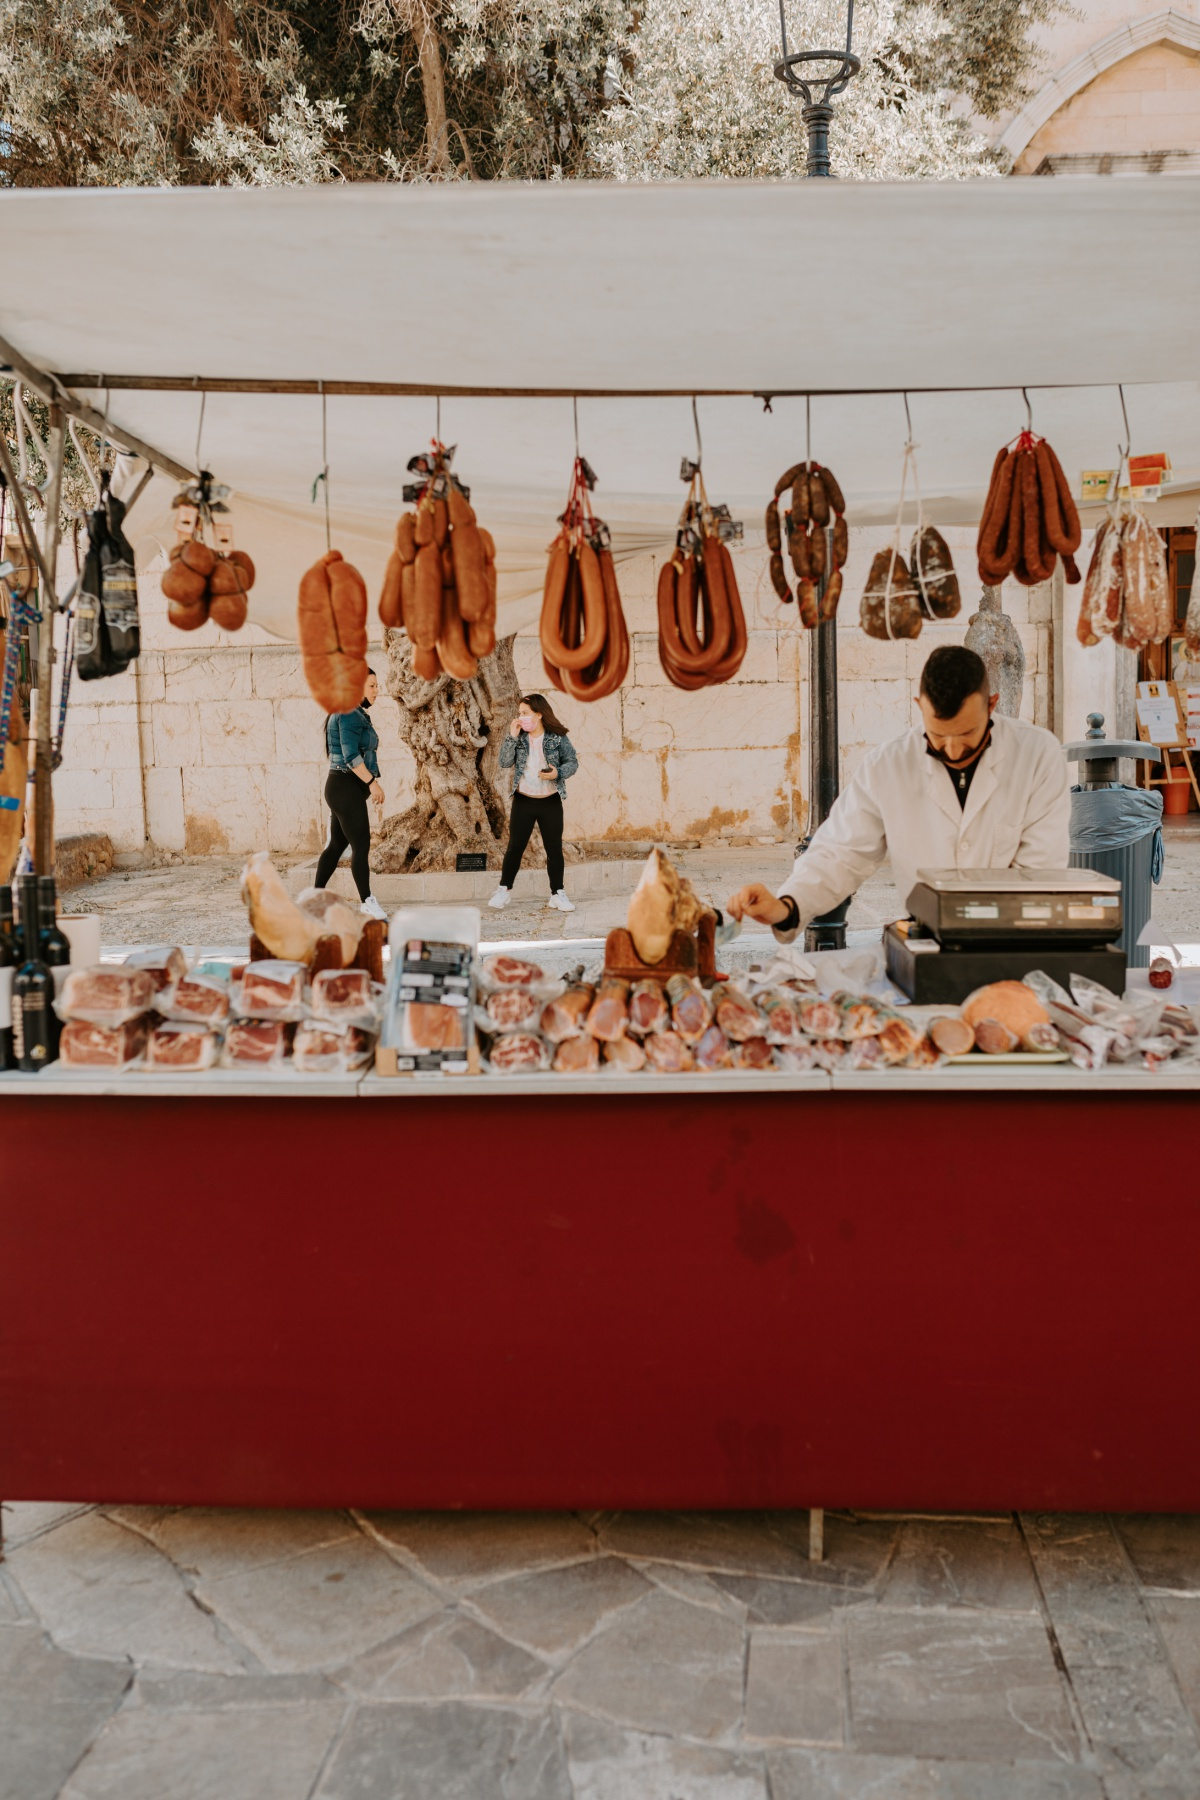 Meat vendor at the Inca Market in Mallorca Spain